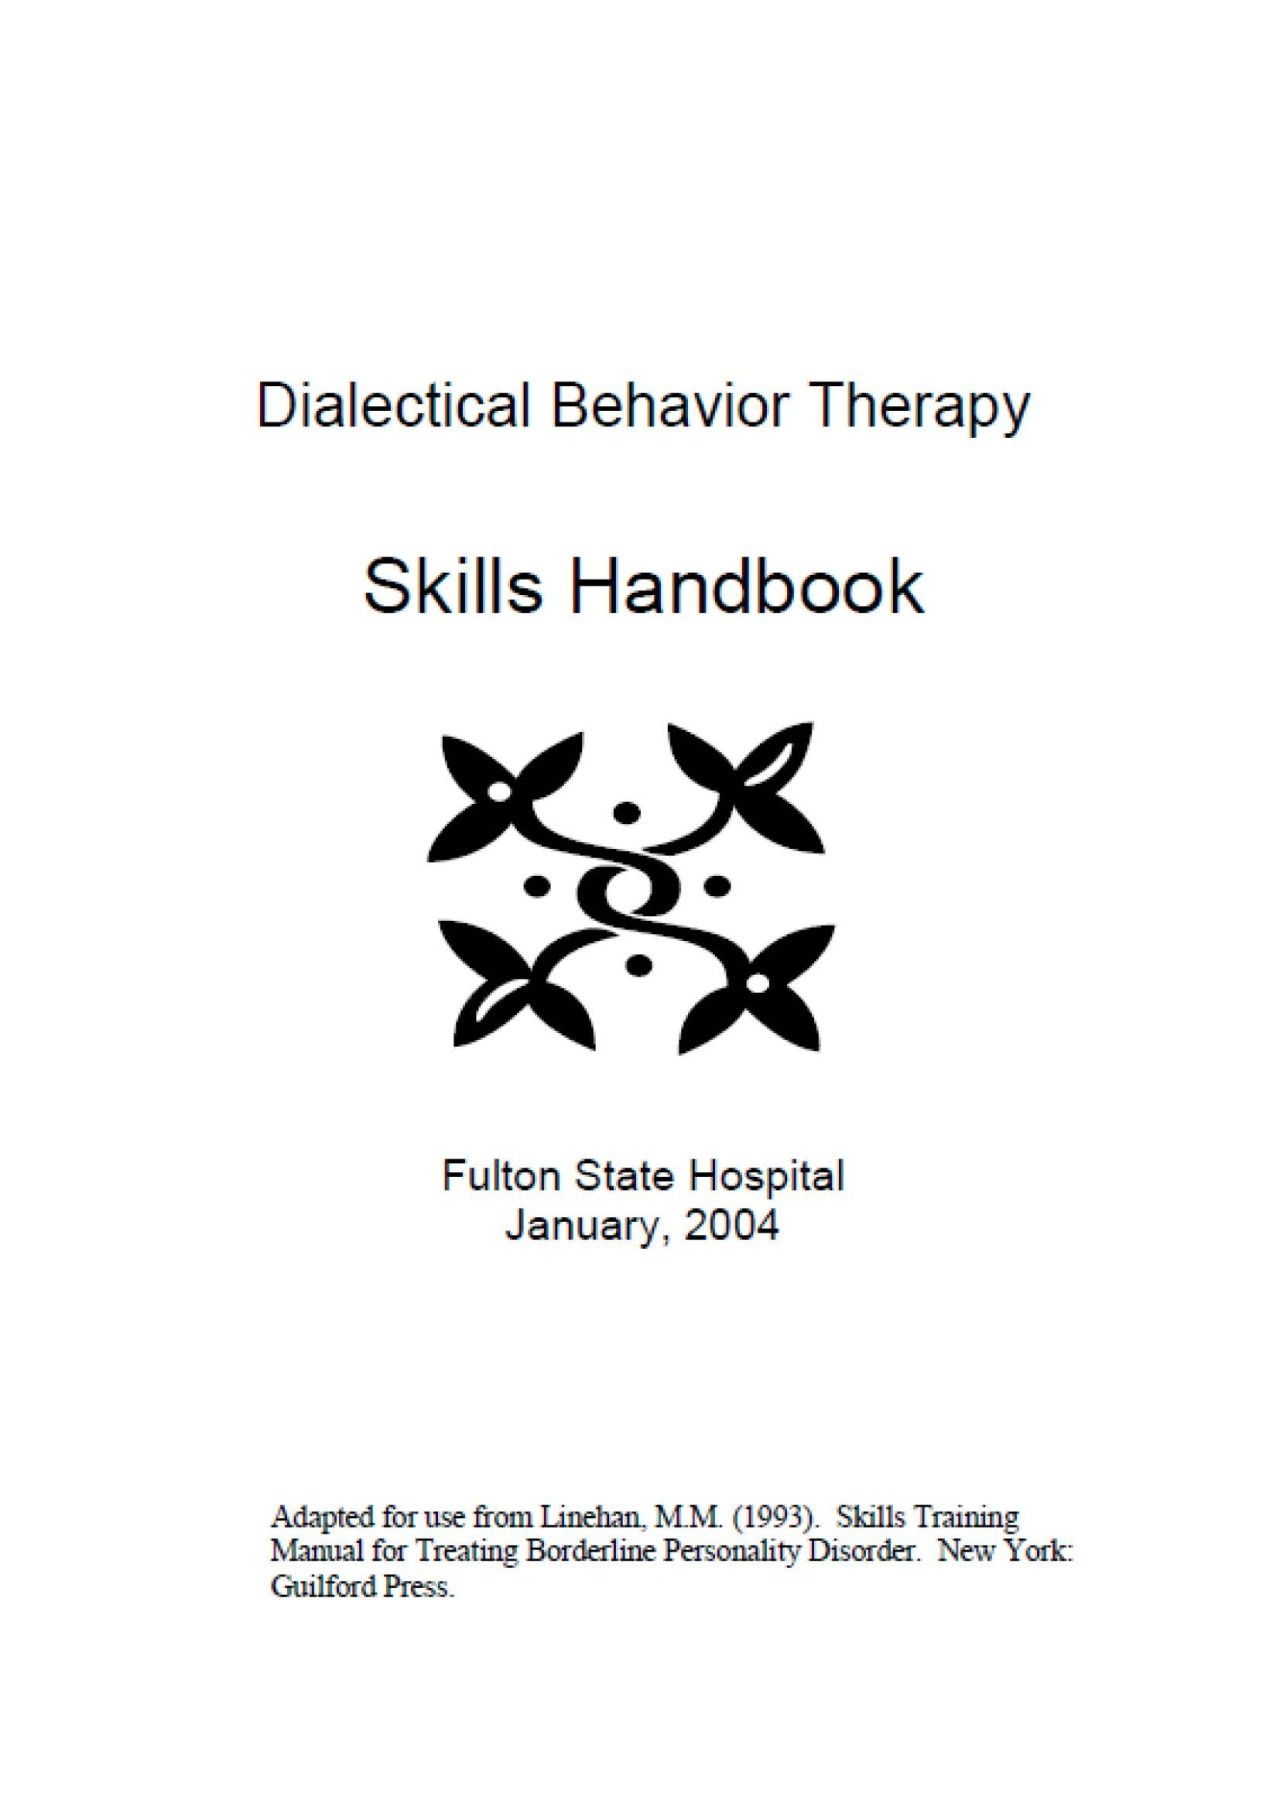 Creative Clinical Social Worker